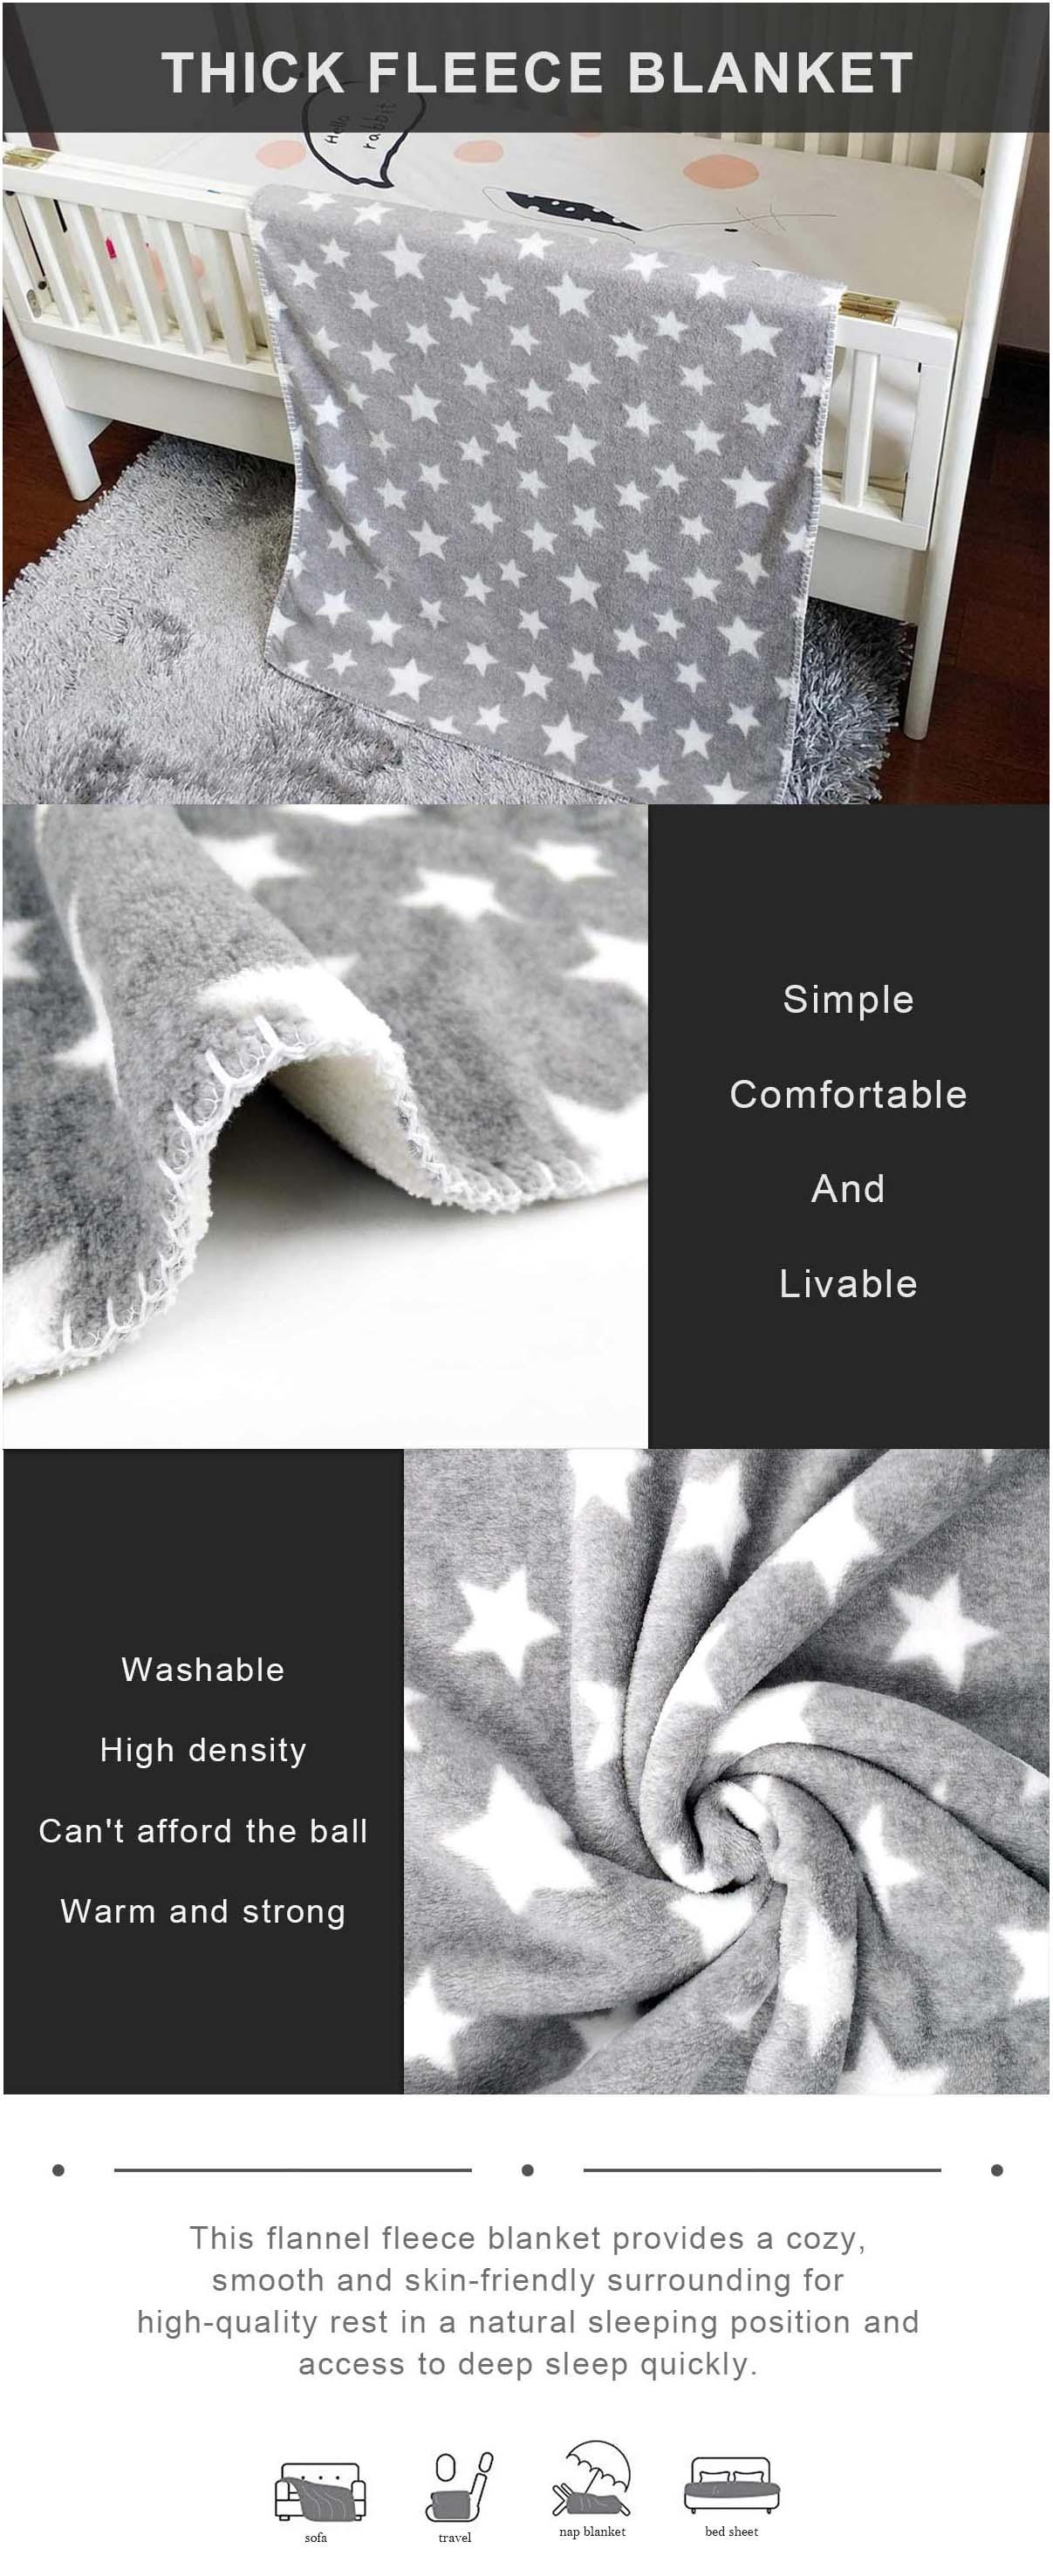 Thick Fleece Blanket